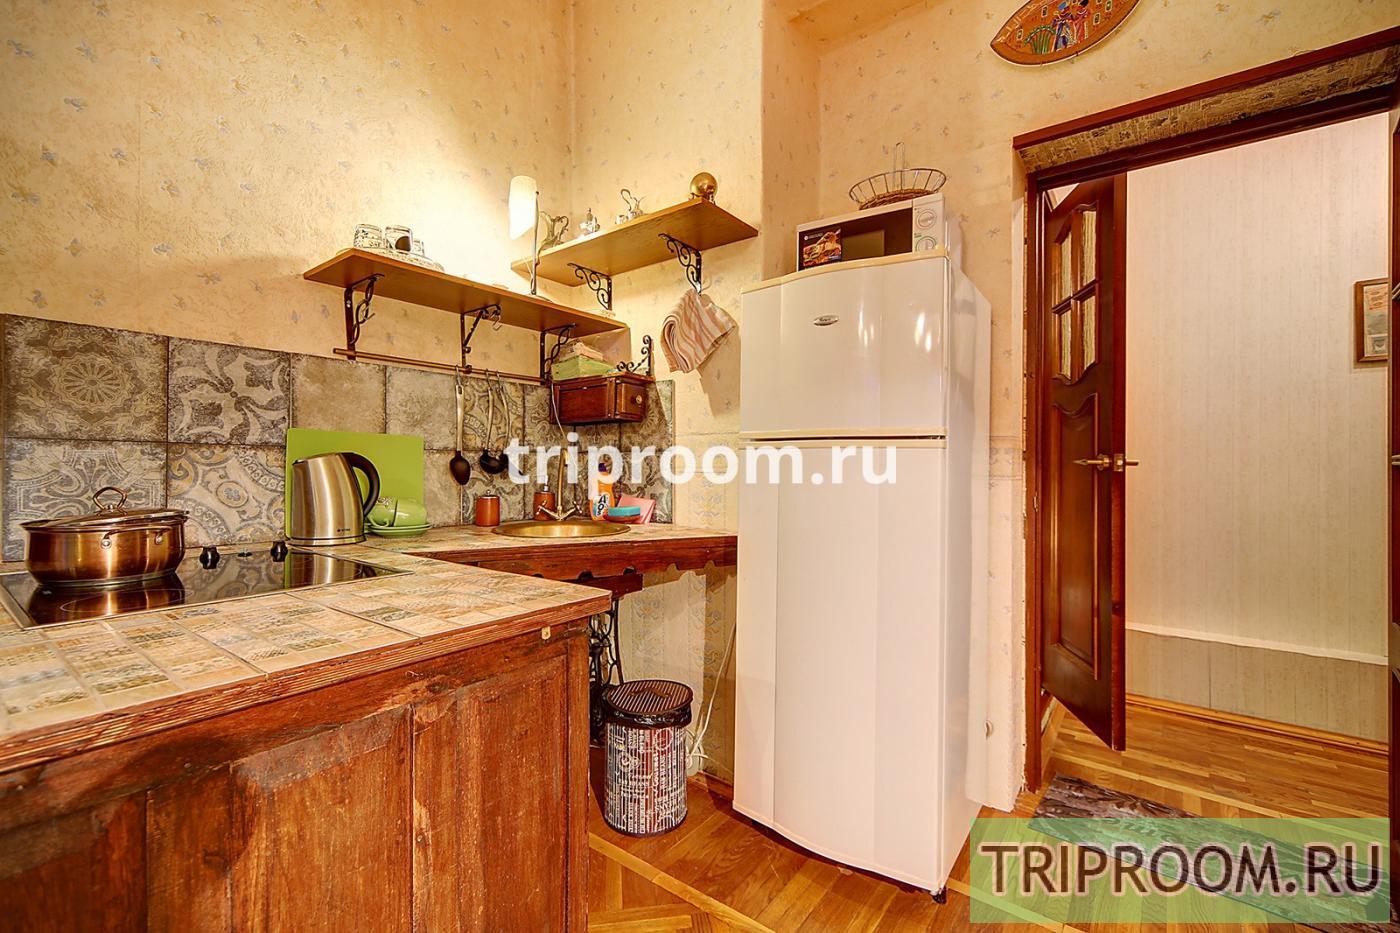 1-комнатная квартира посуточно (вариант № 15445), ул. Лиговский проспект, фото № 14